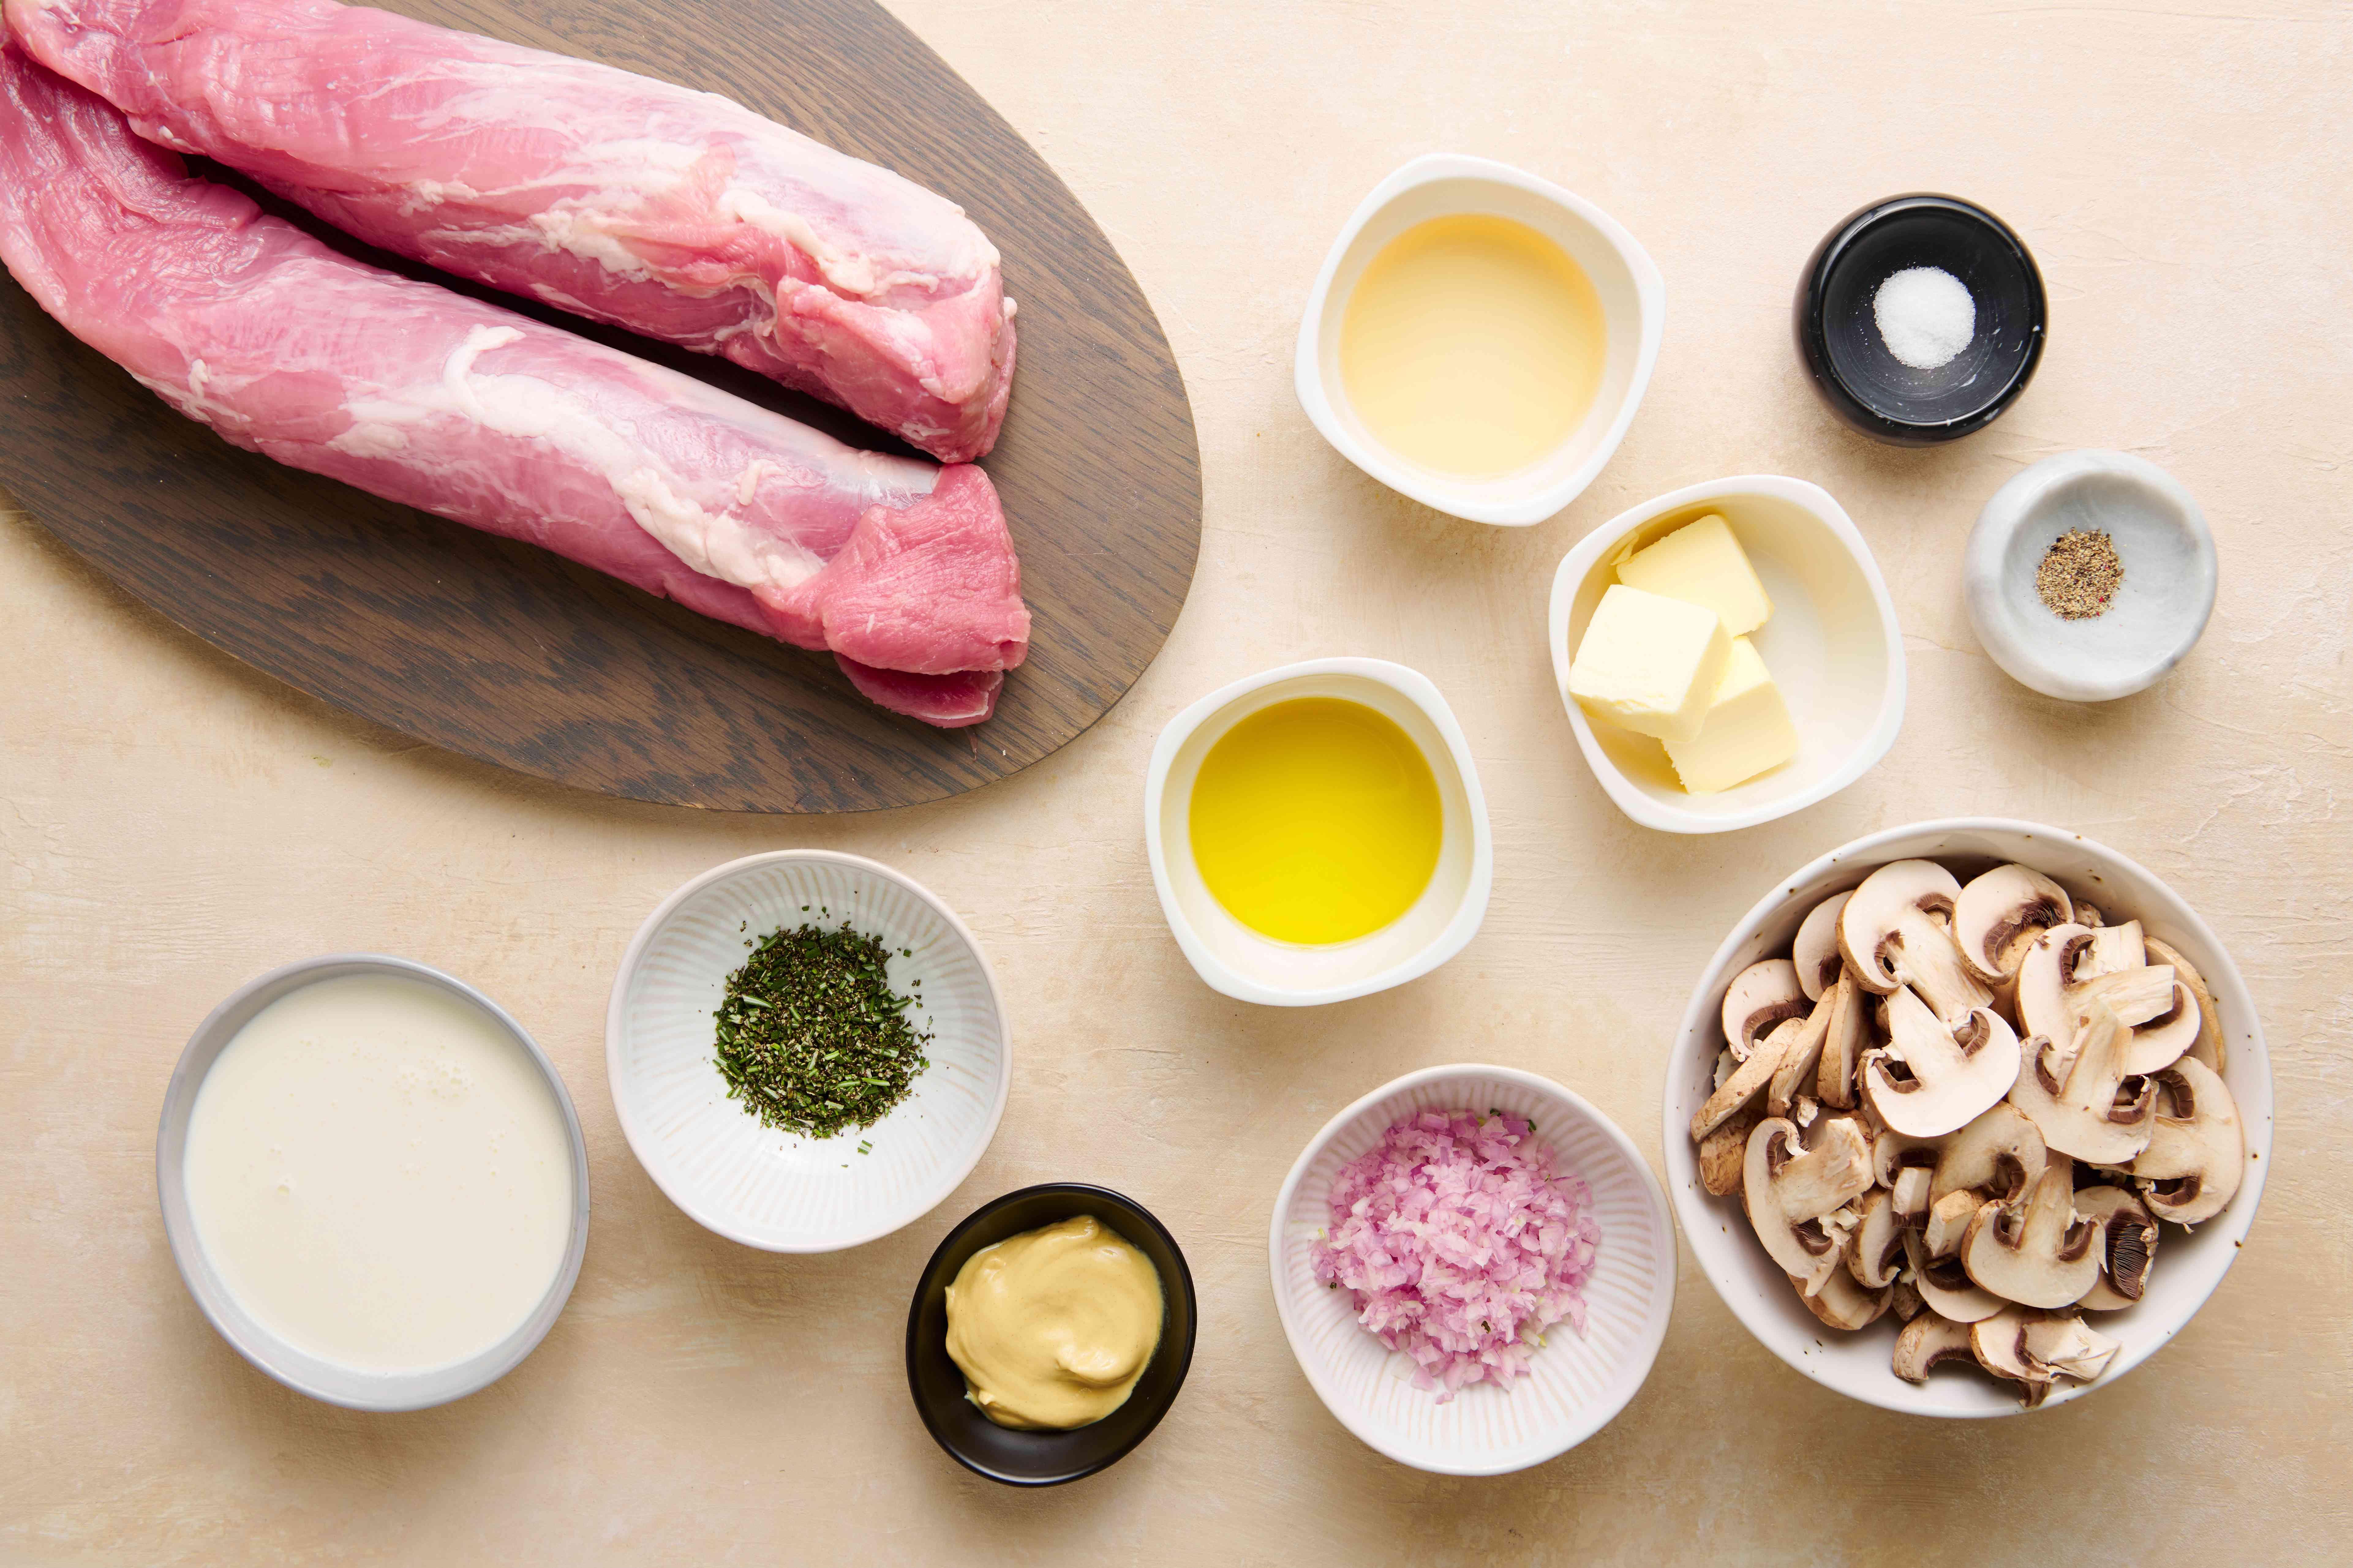 Pork Tenderloin Medallions With Dijon Mushroom Sauce ingredients